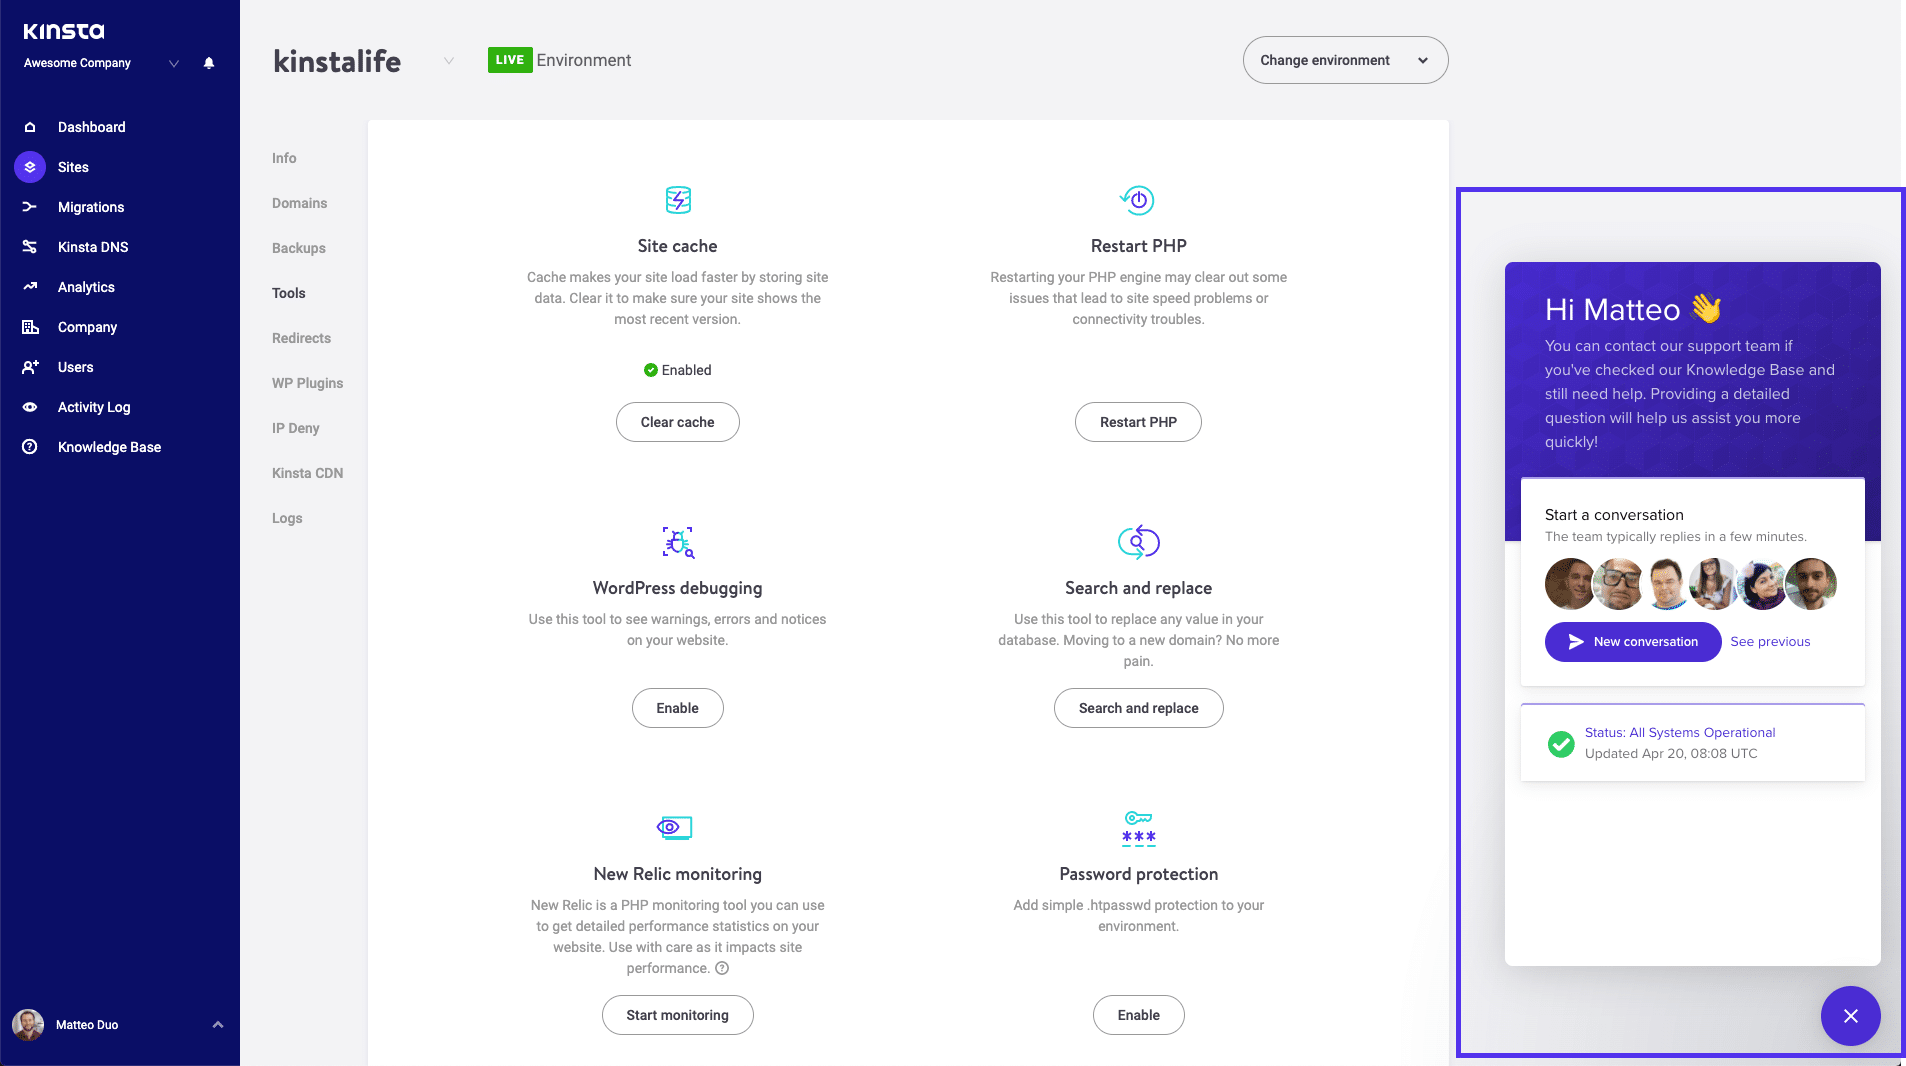 Wie man den Kinsta Support kontaktiert